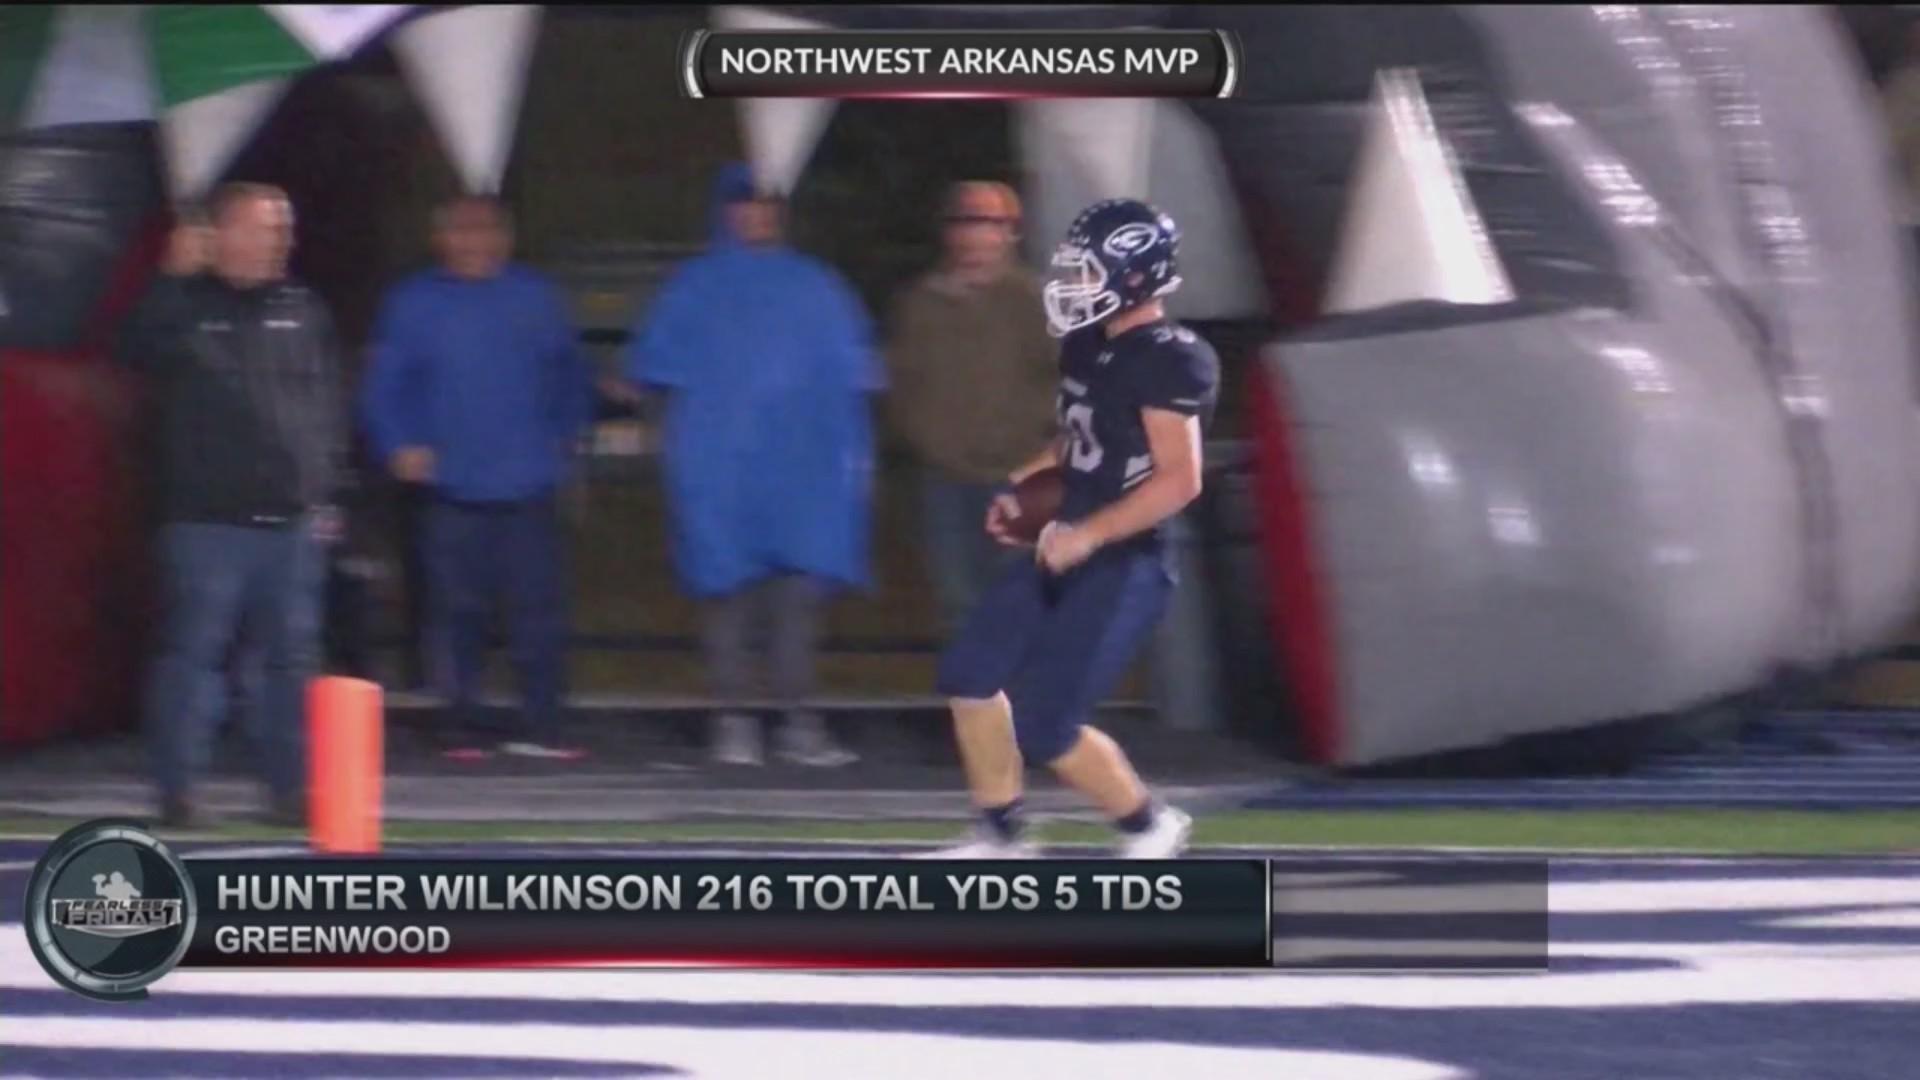 Northwest_Arkansas_MVP__Greenwood_s_Hunt_0_20181027143245